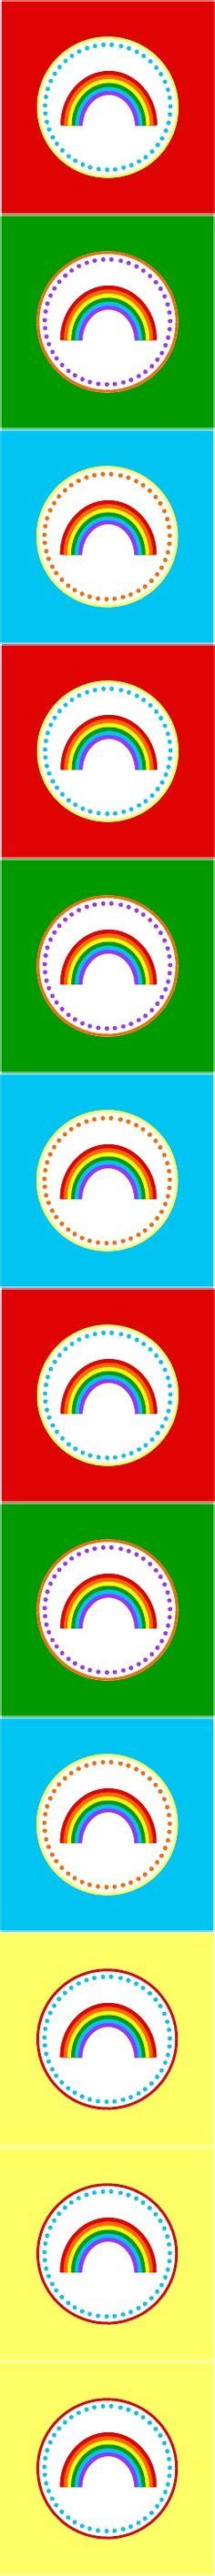 arco iris imprimibles